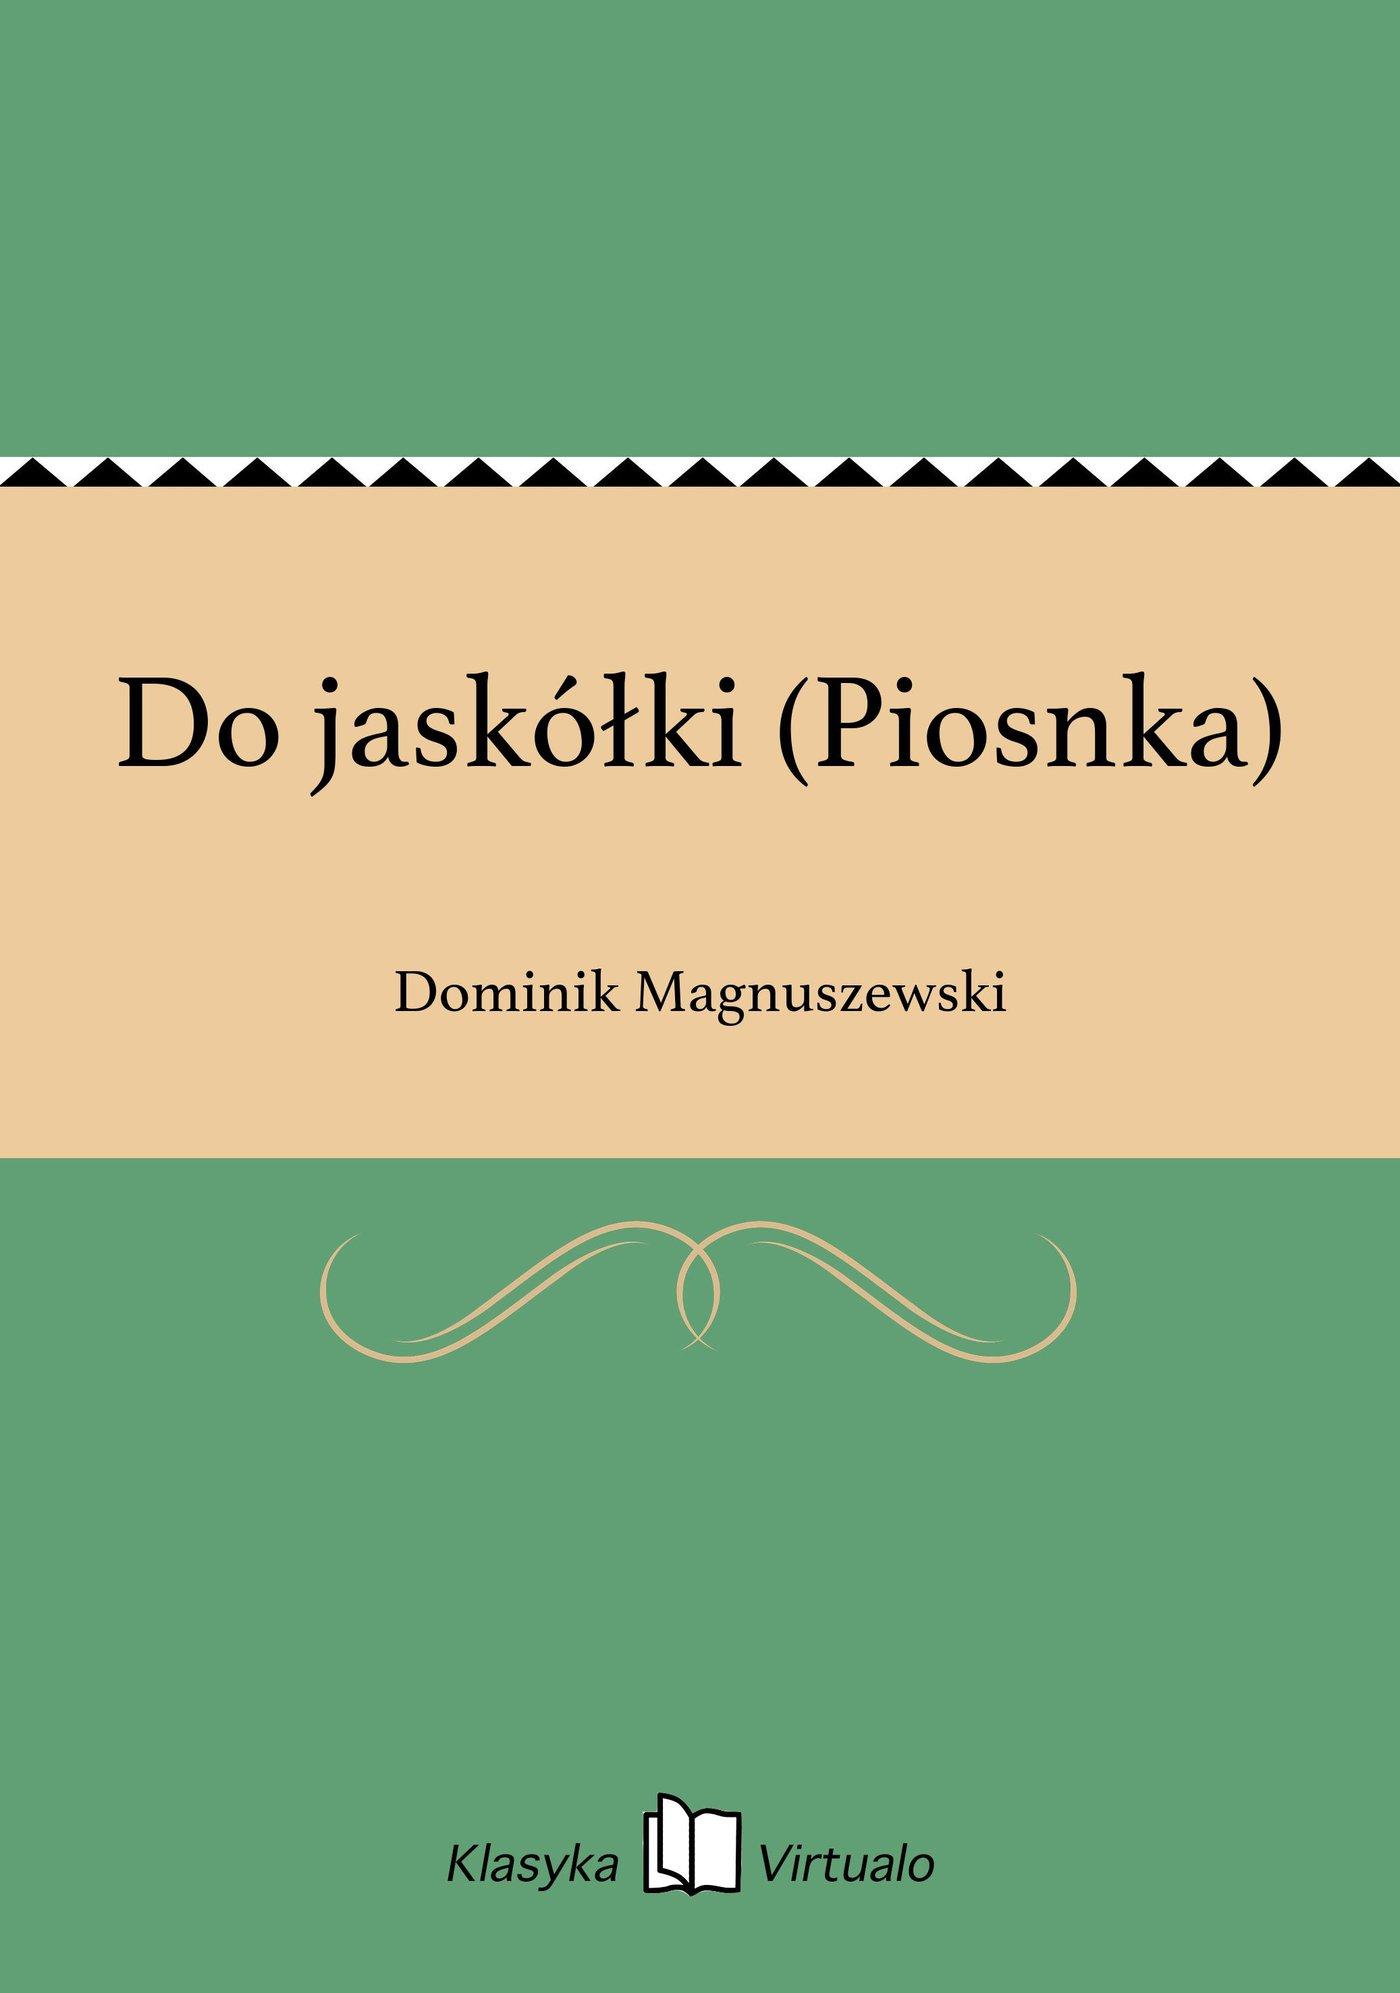 Do jaskółki (Piosnka) - Ebook (Książka na Kindle) do pobrania w formacie MOBI